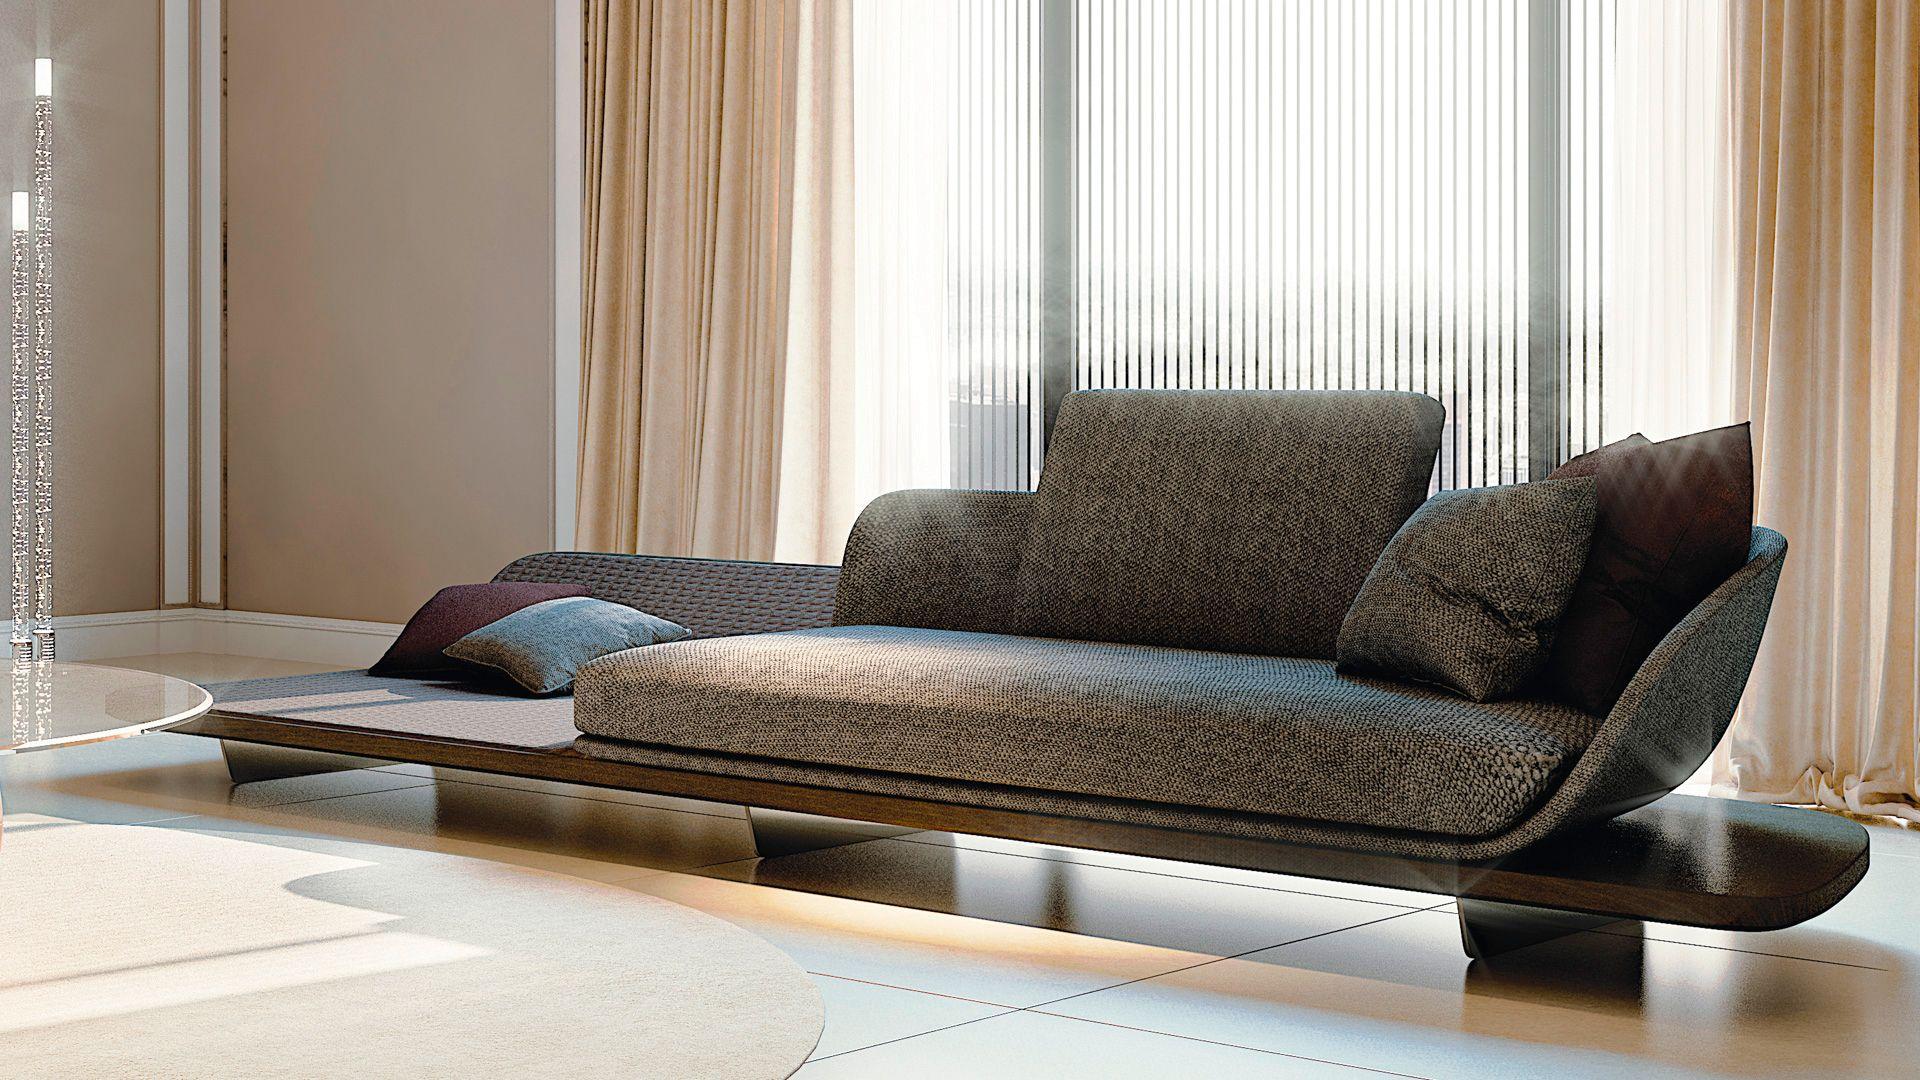 High End Italian Segno Chaise Lounge Italian Designer Luxury